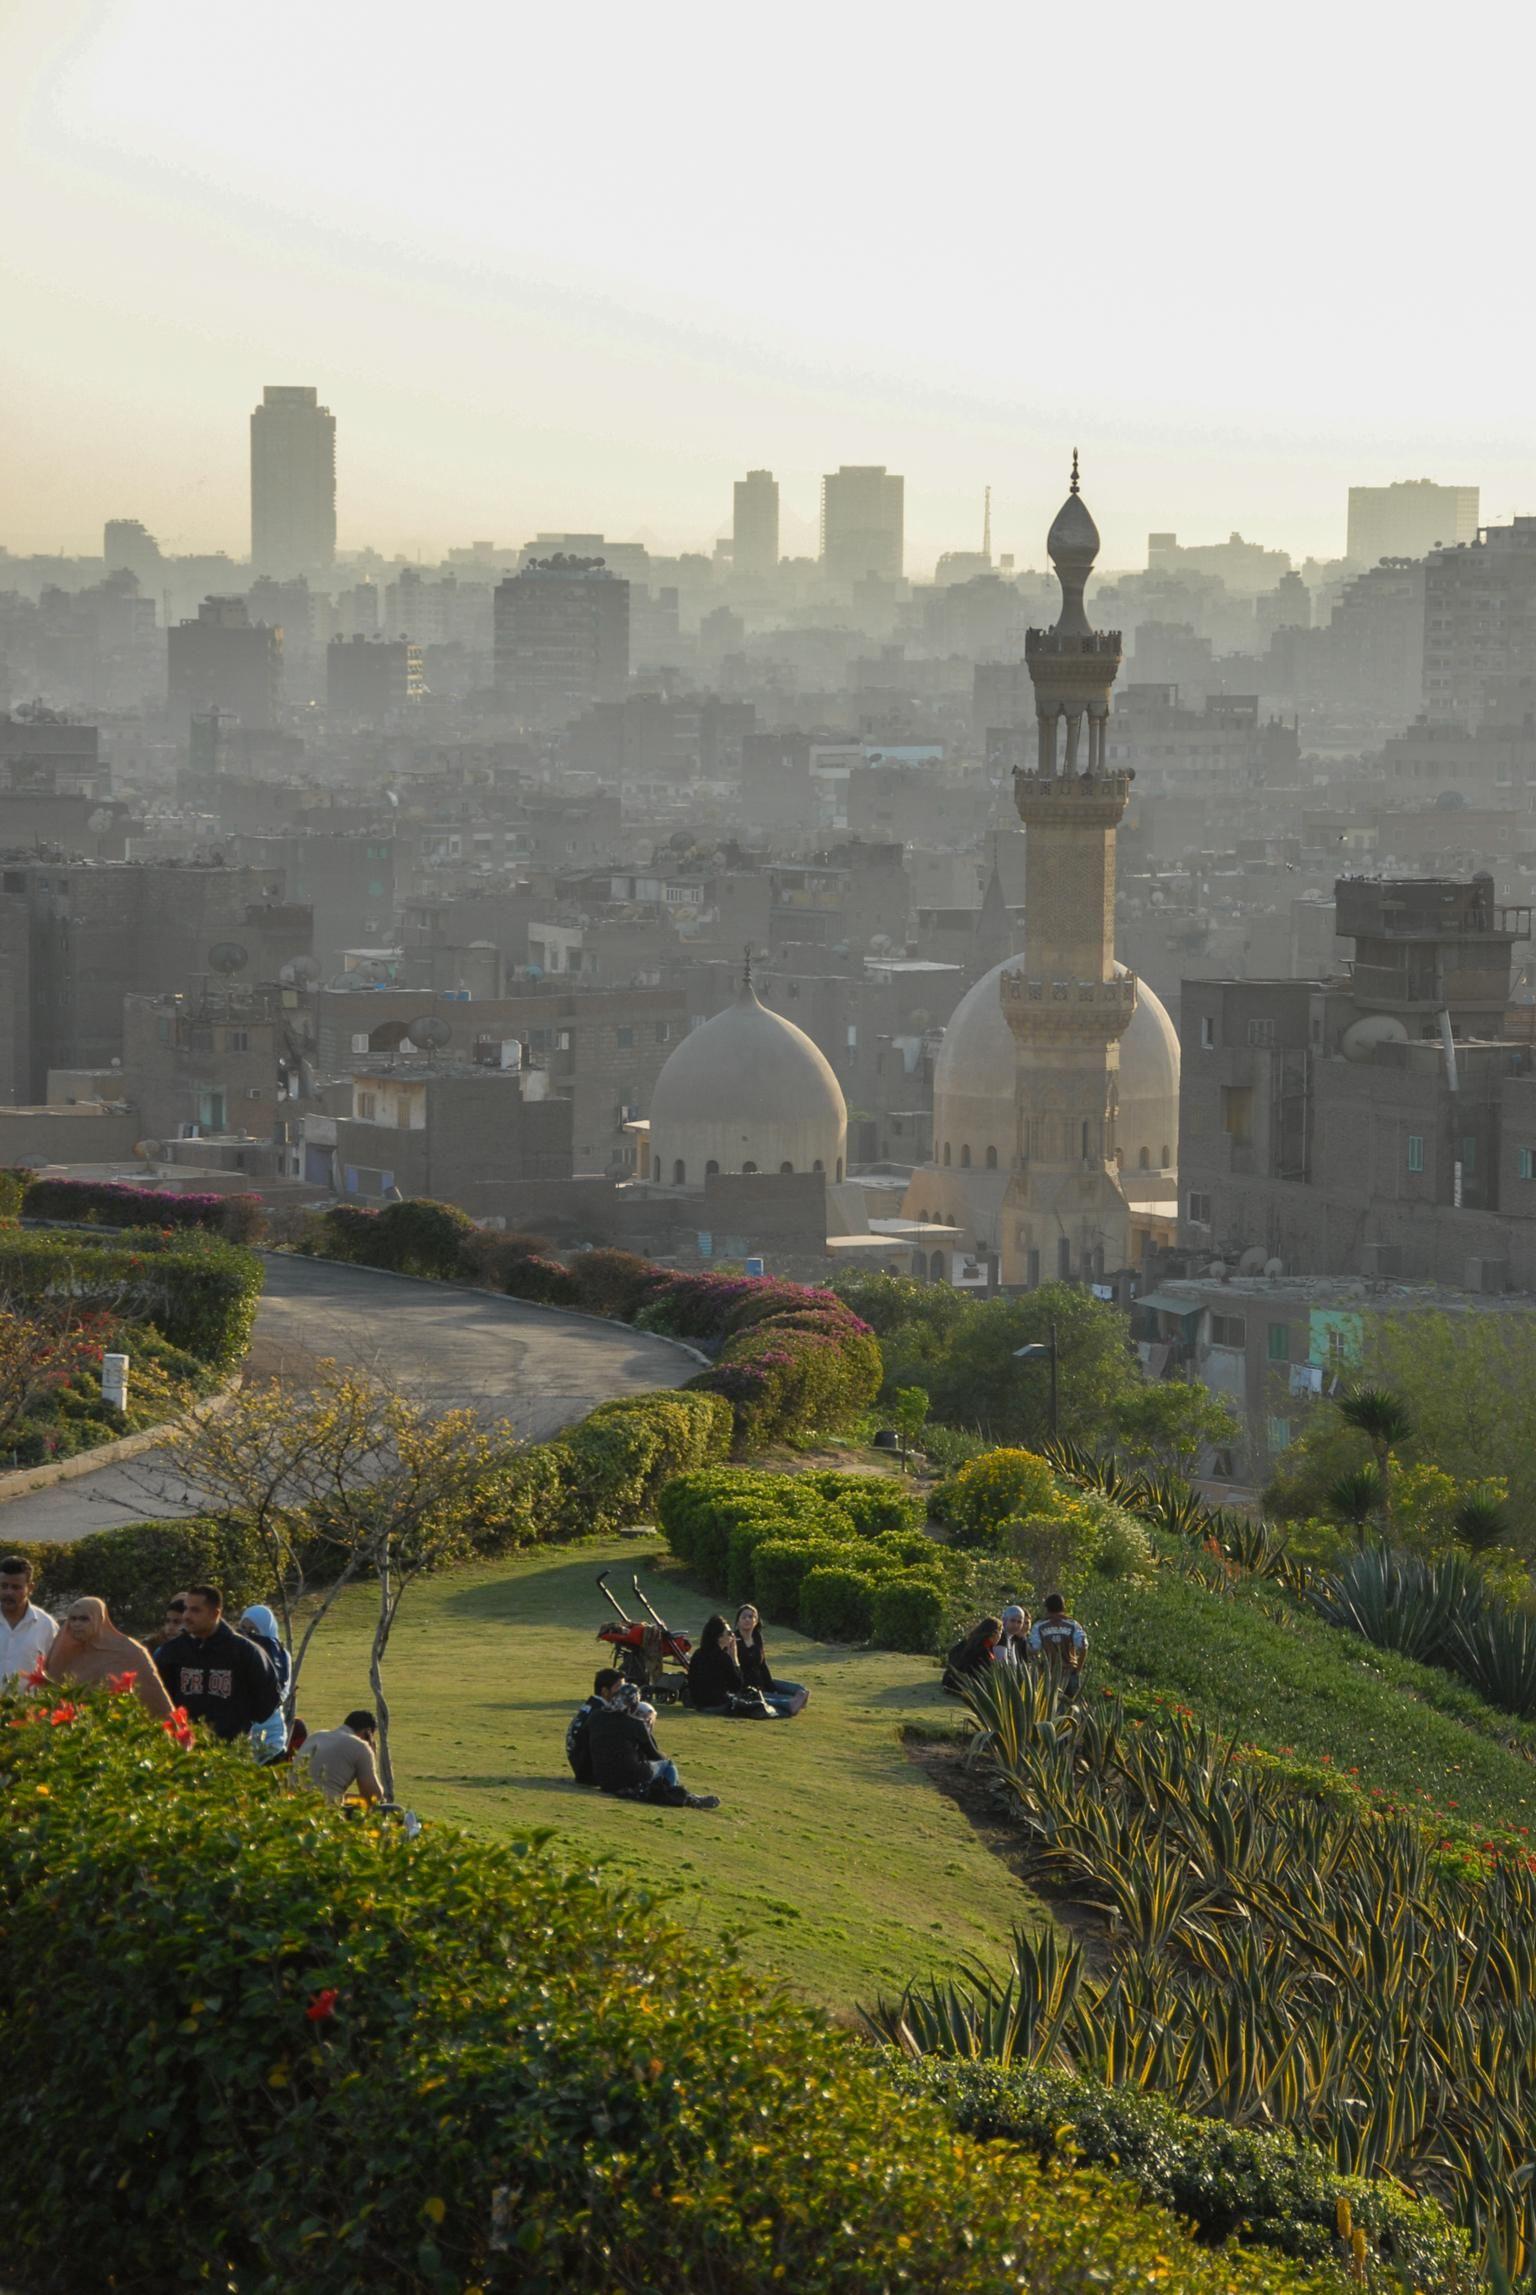 thousand minarets of a City